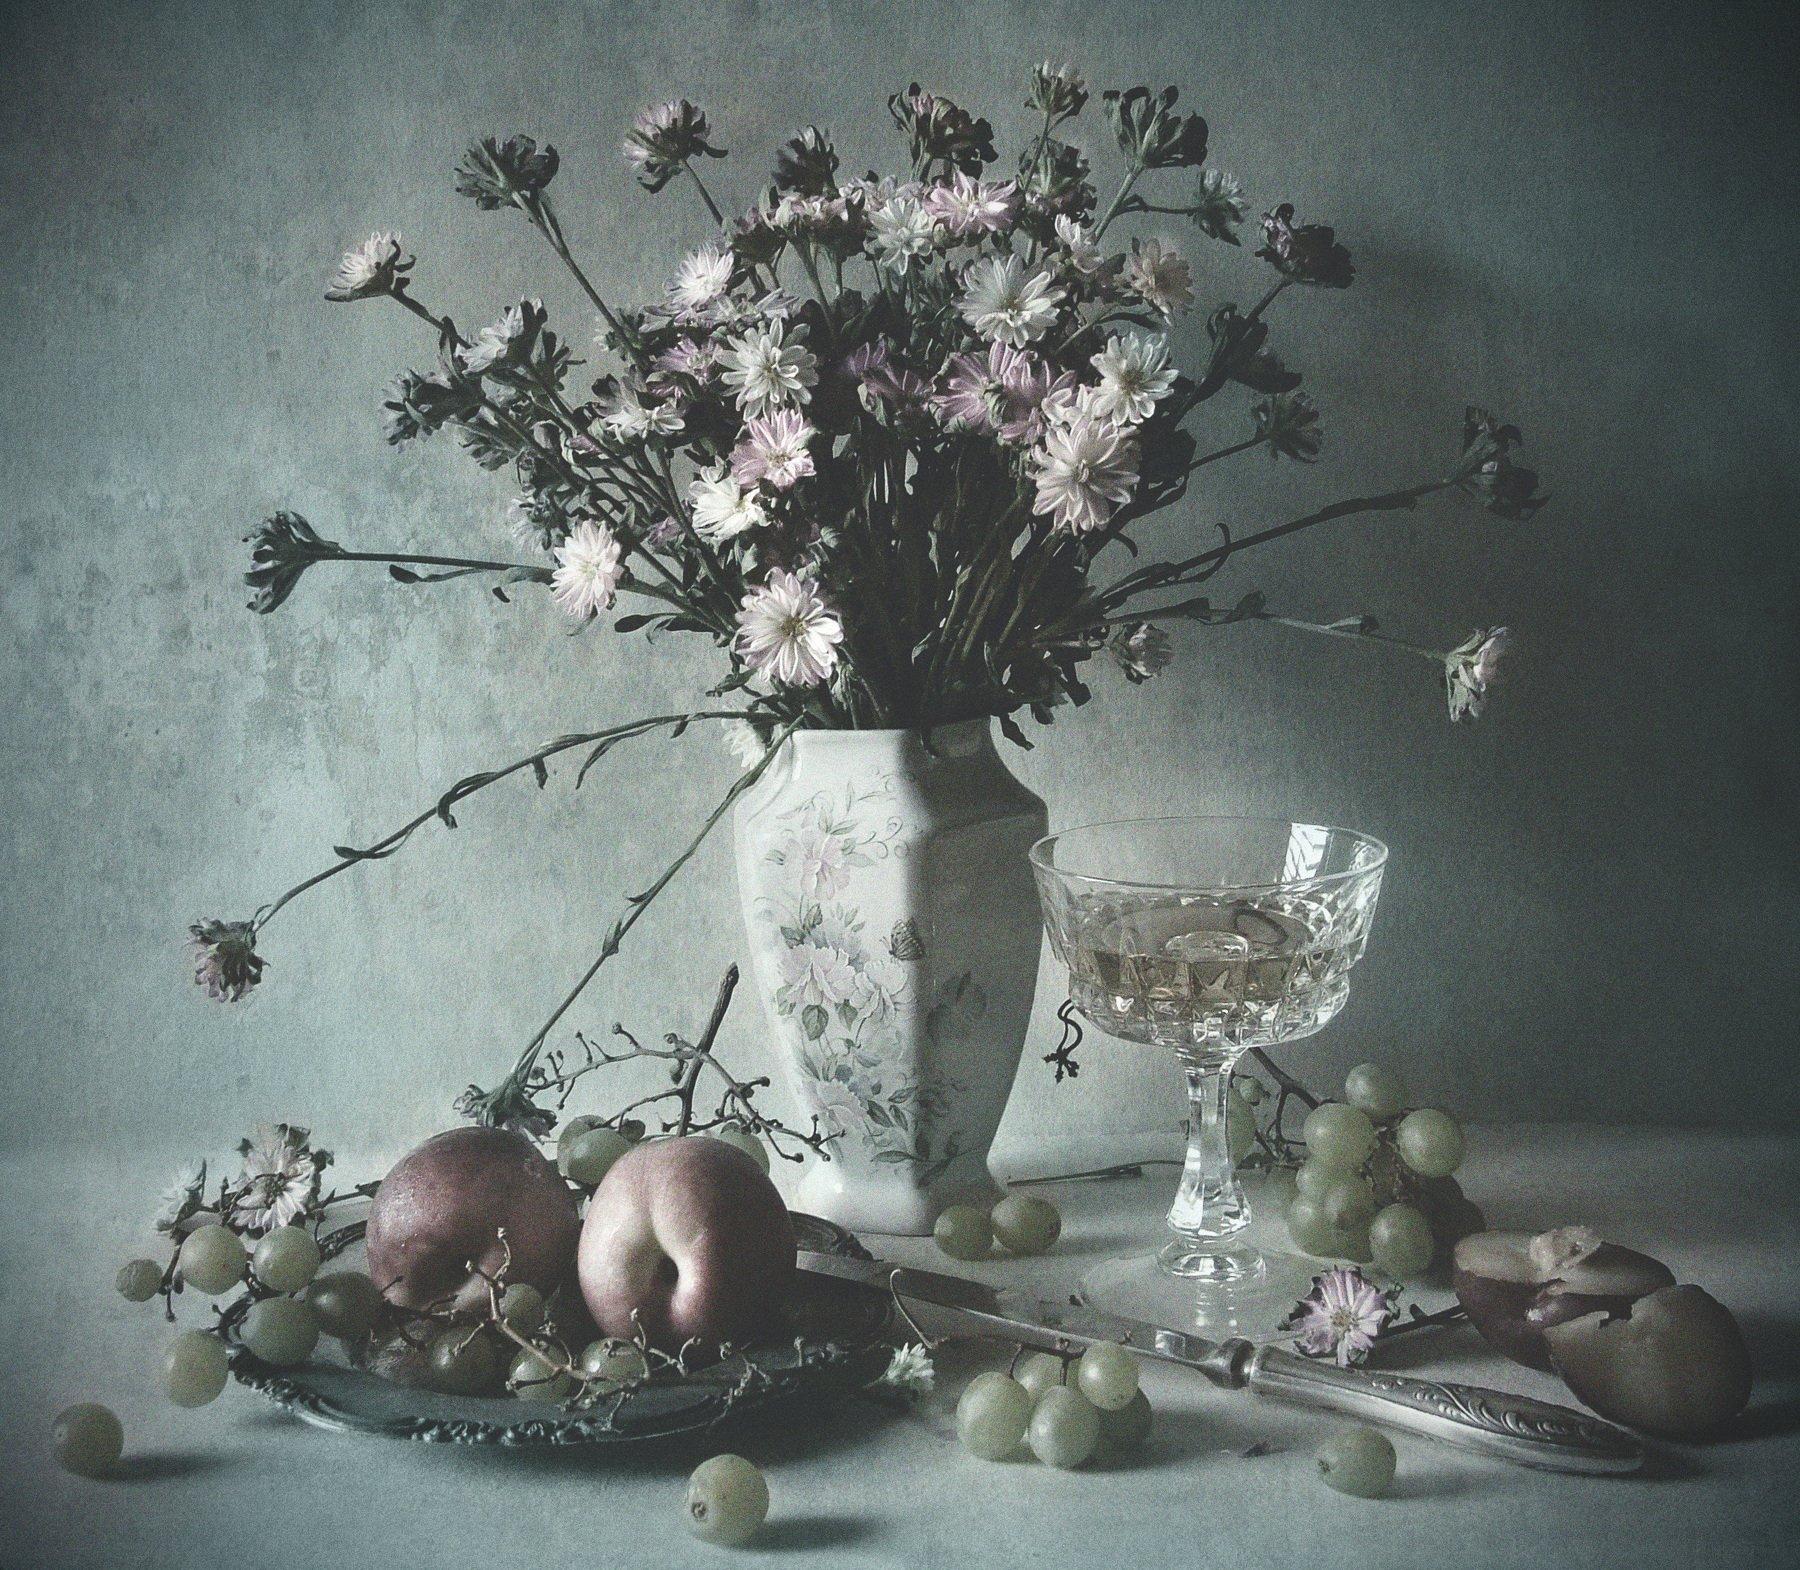 wine, flowers, glass, peach, grape, vase, texture, Andrei Blank